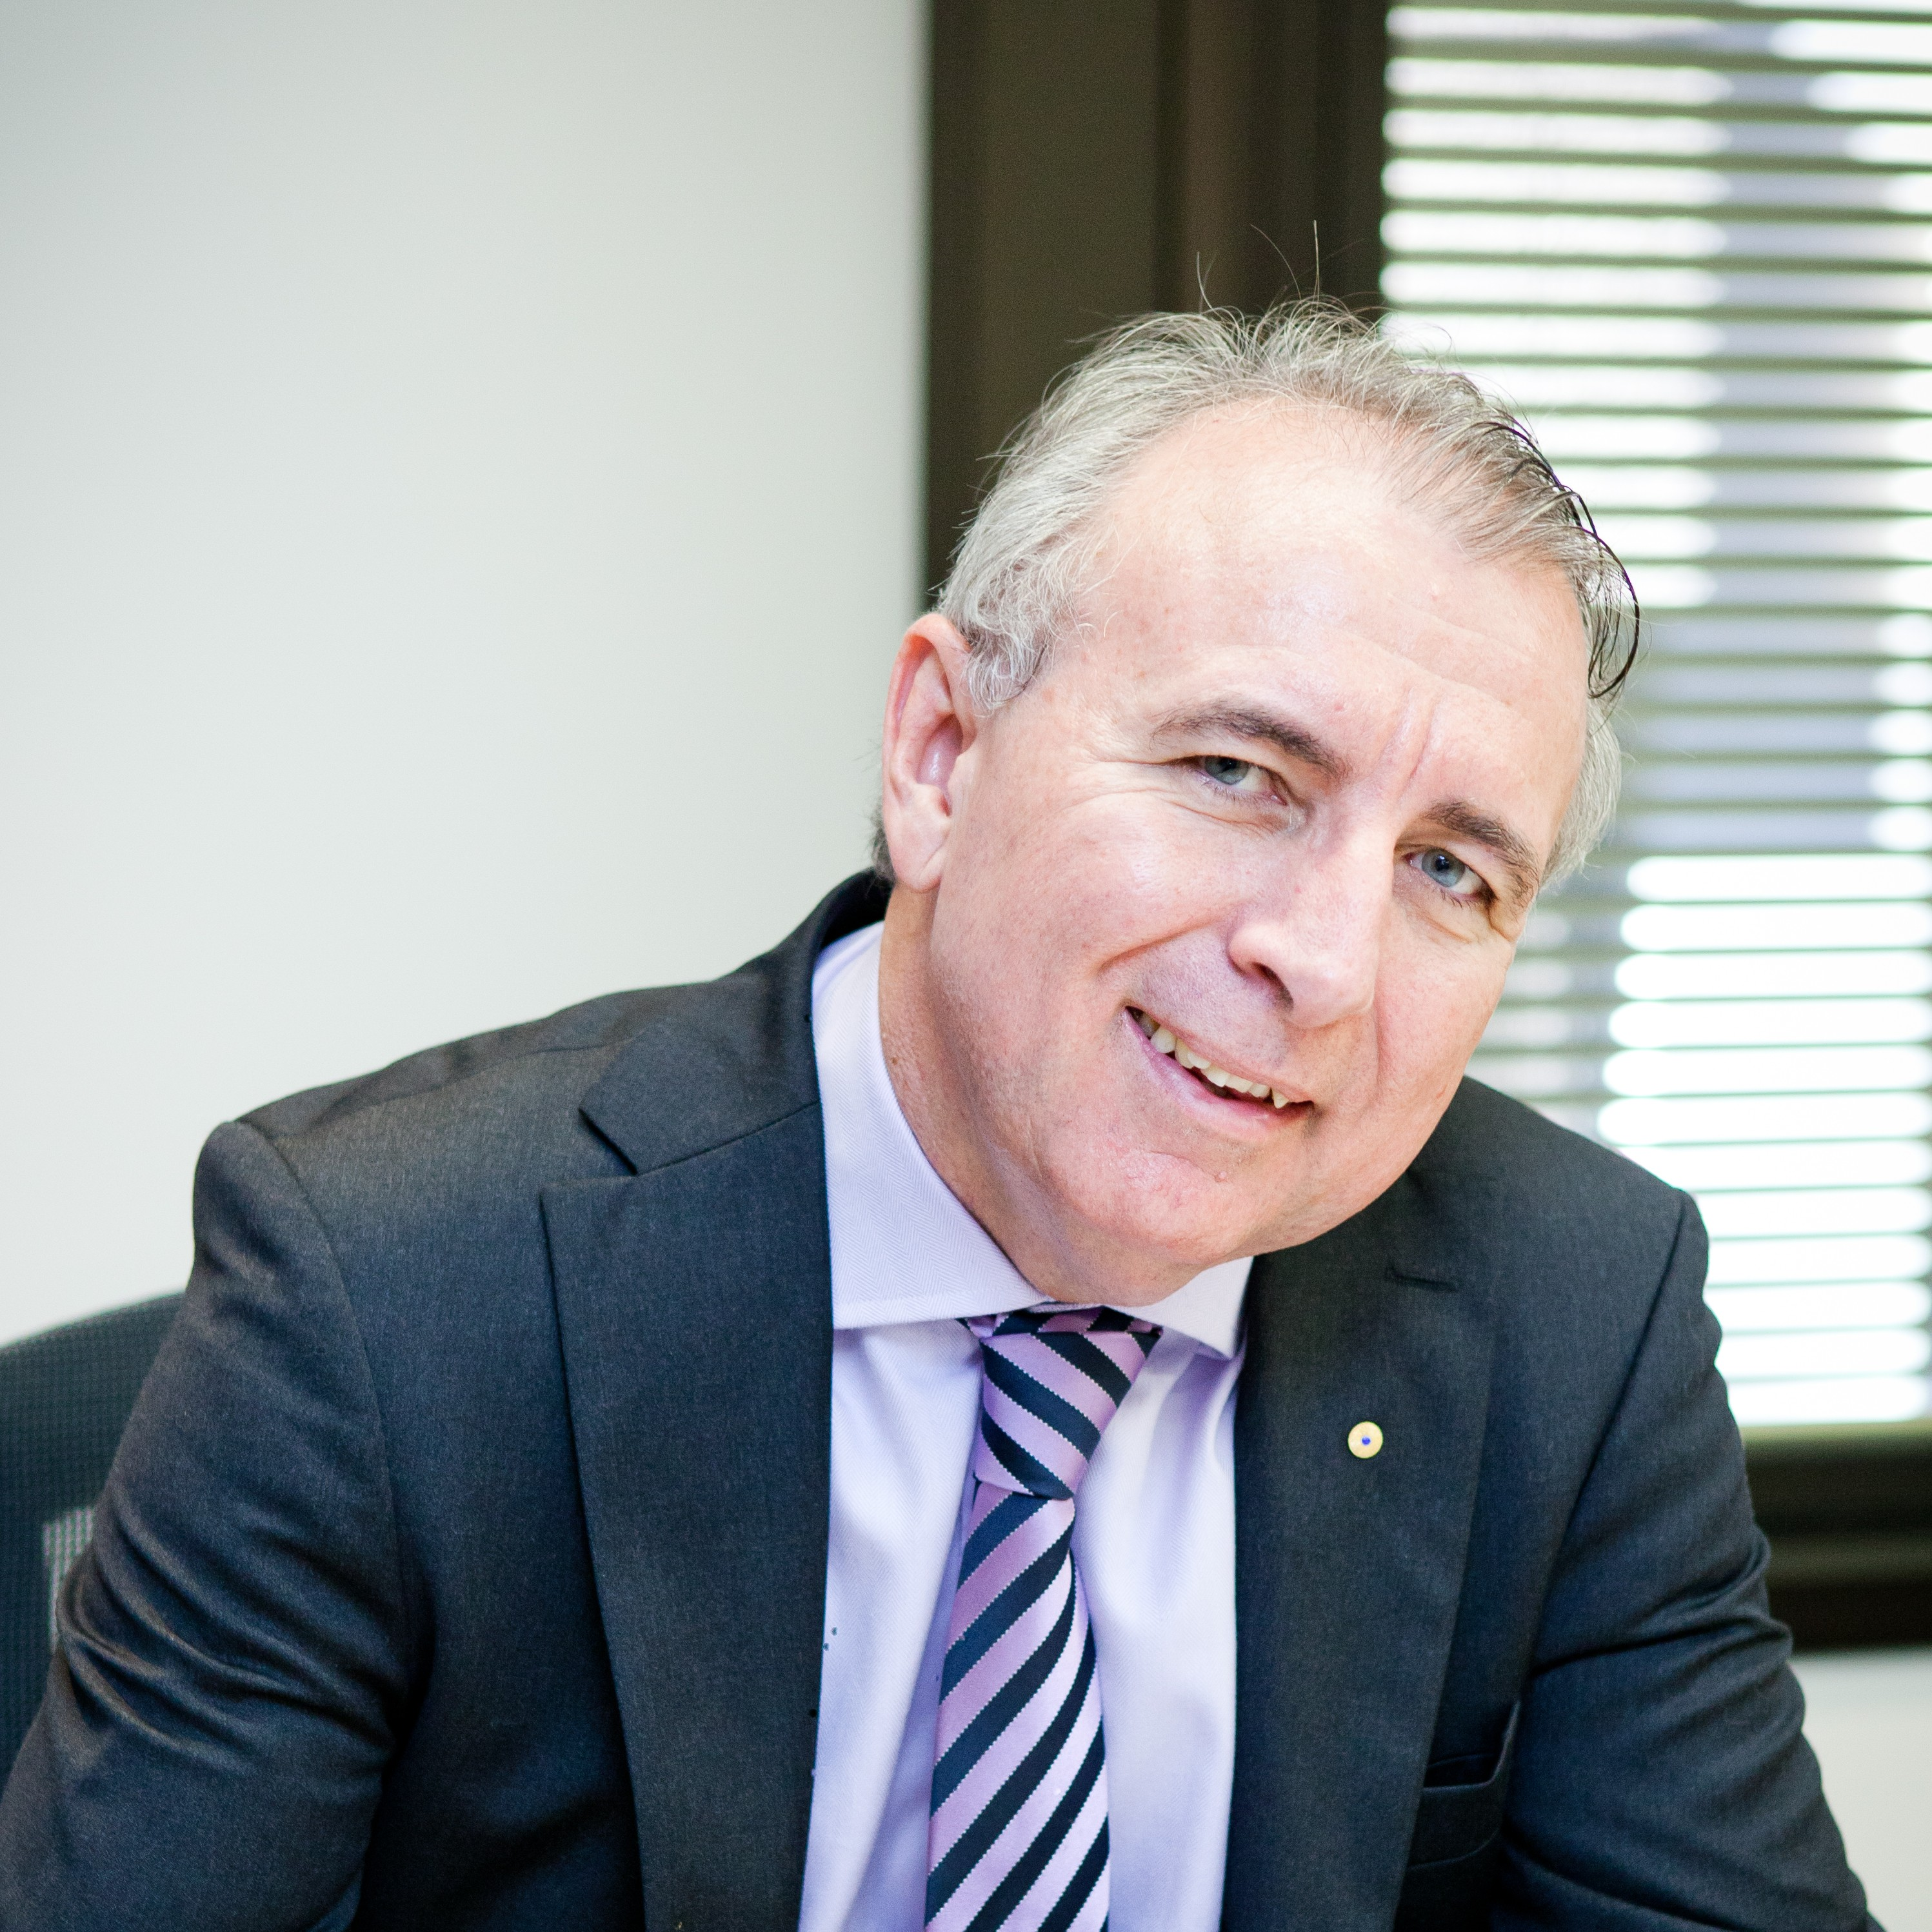 The Hon Michael Lavarch AO